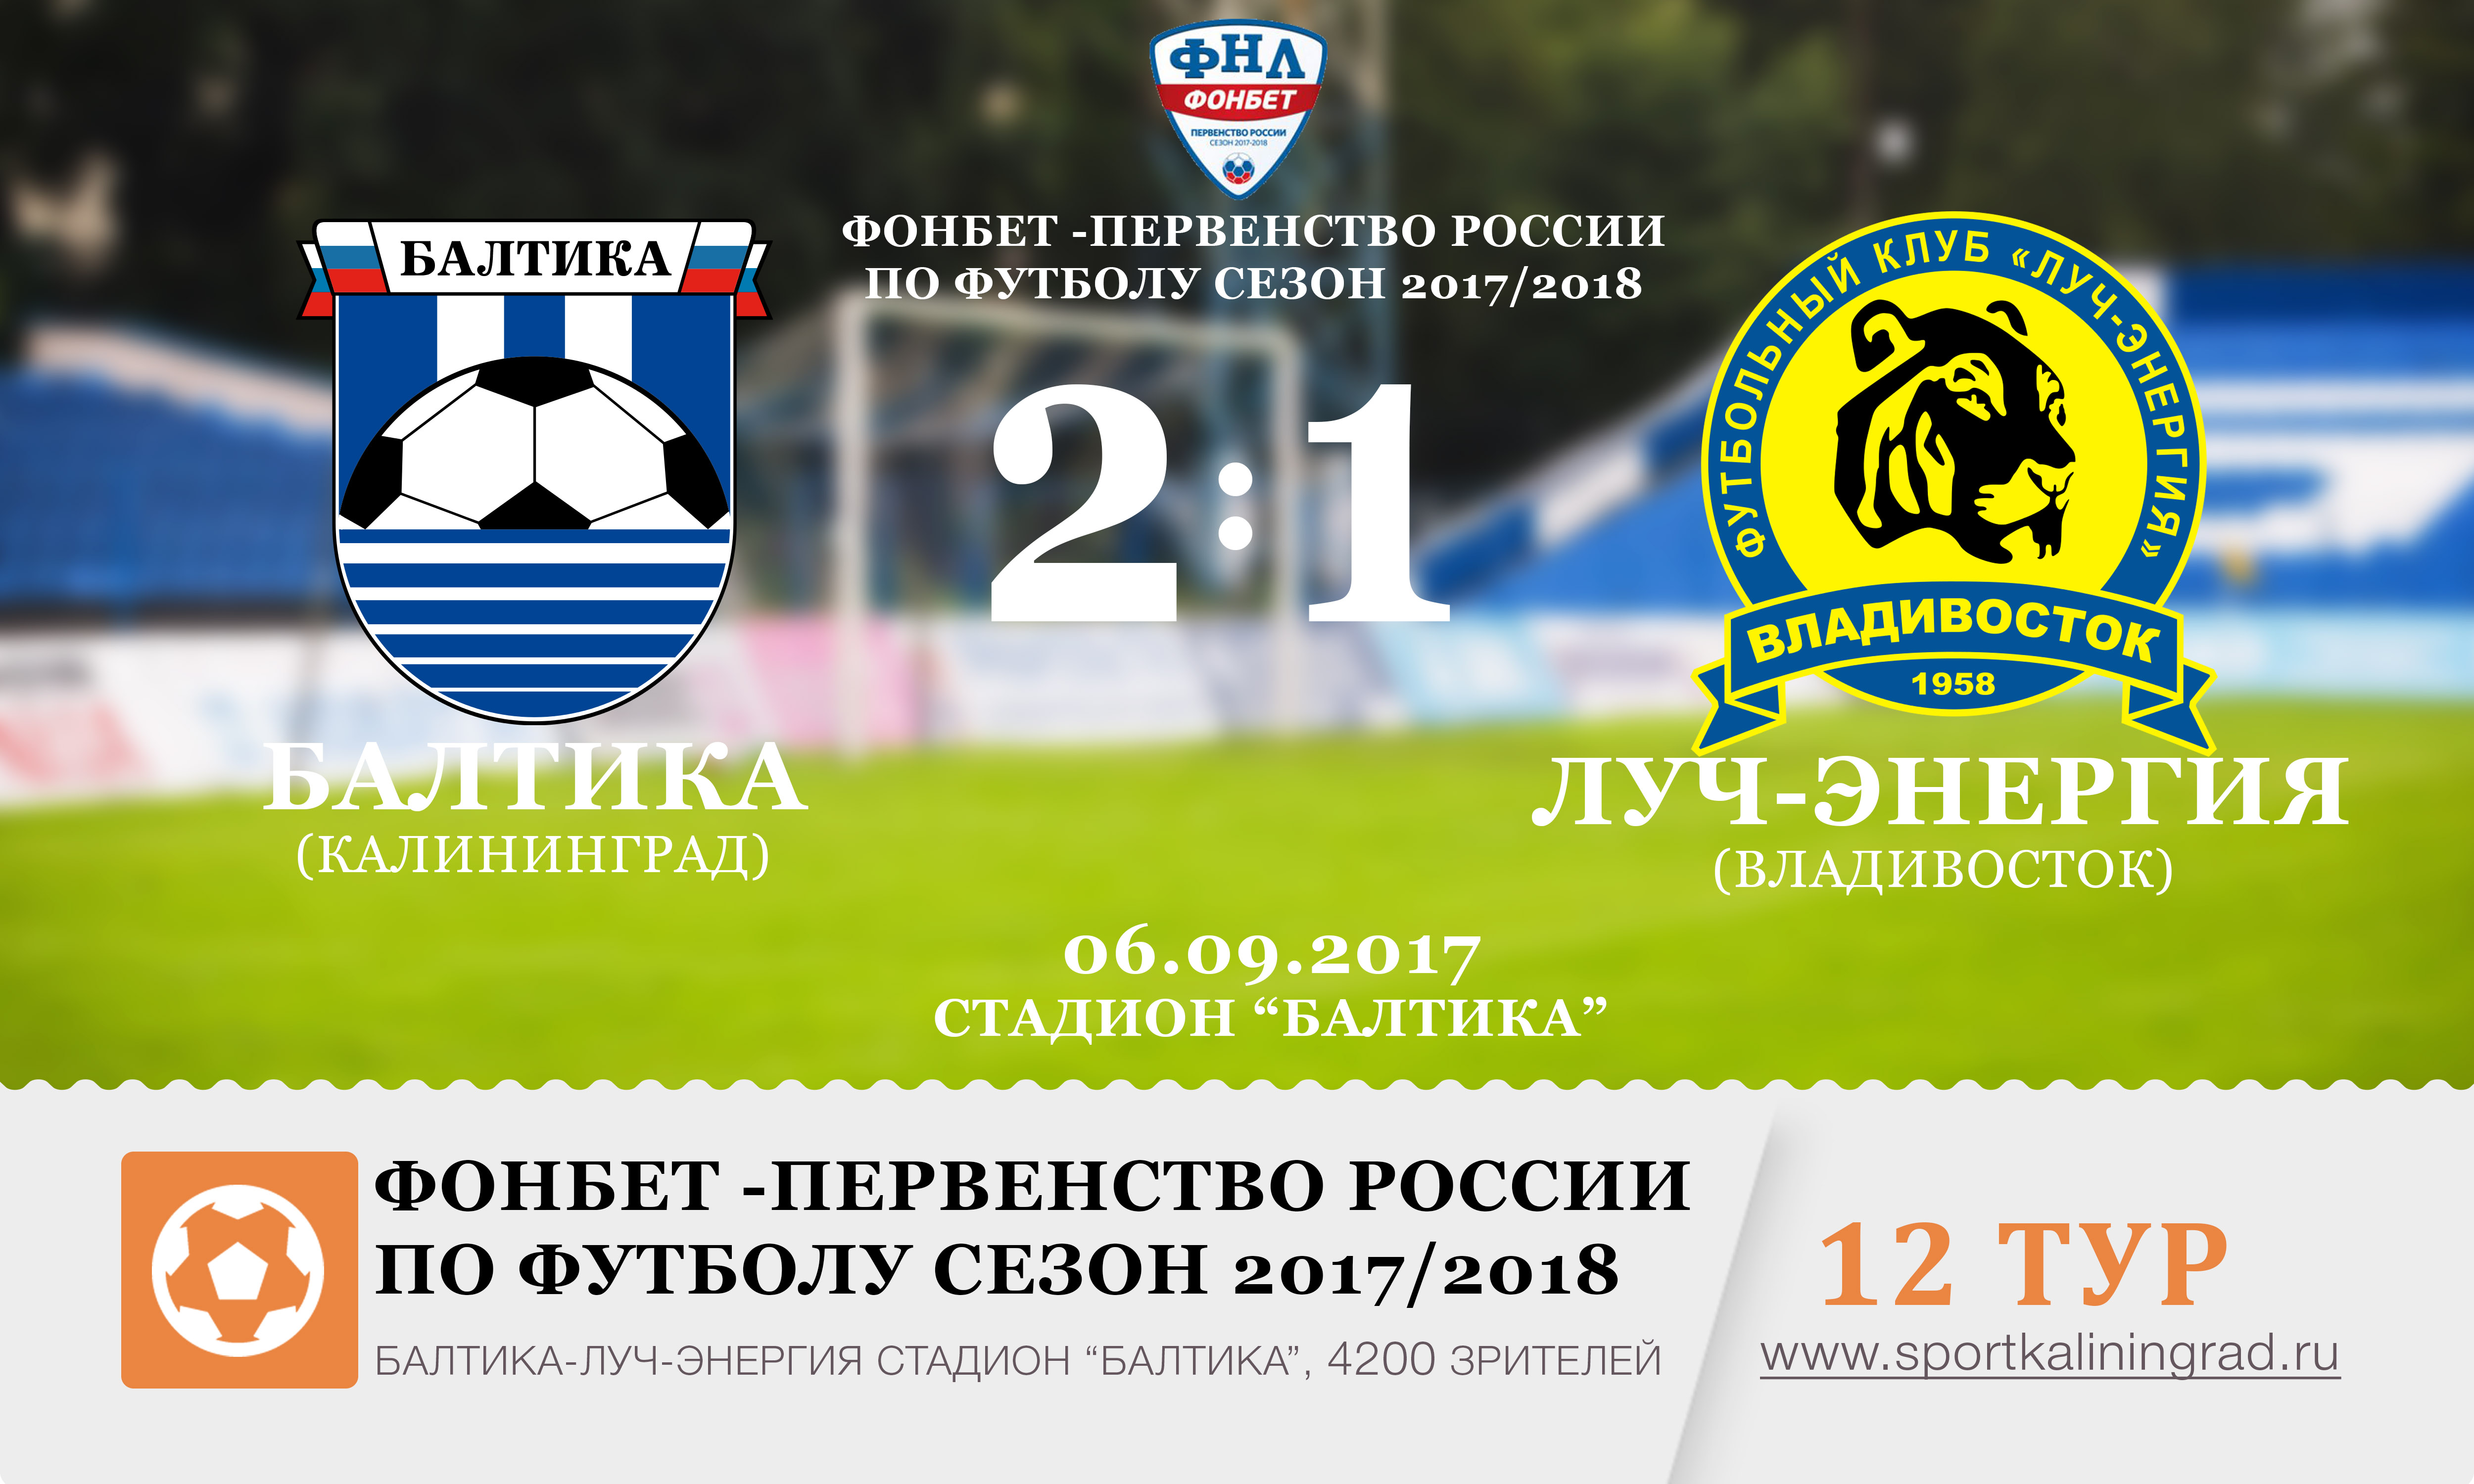 futbol-fnl-baltika-2-1-luch-energia-12-tur-rezultat-2017-sportkaliningrad